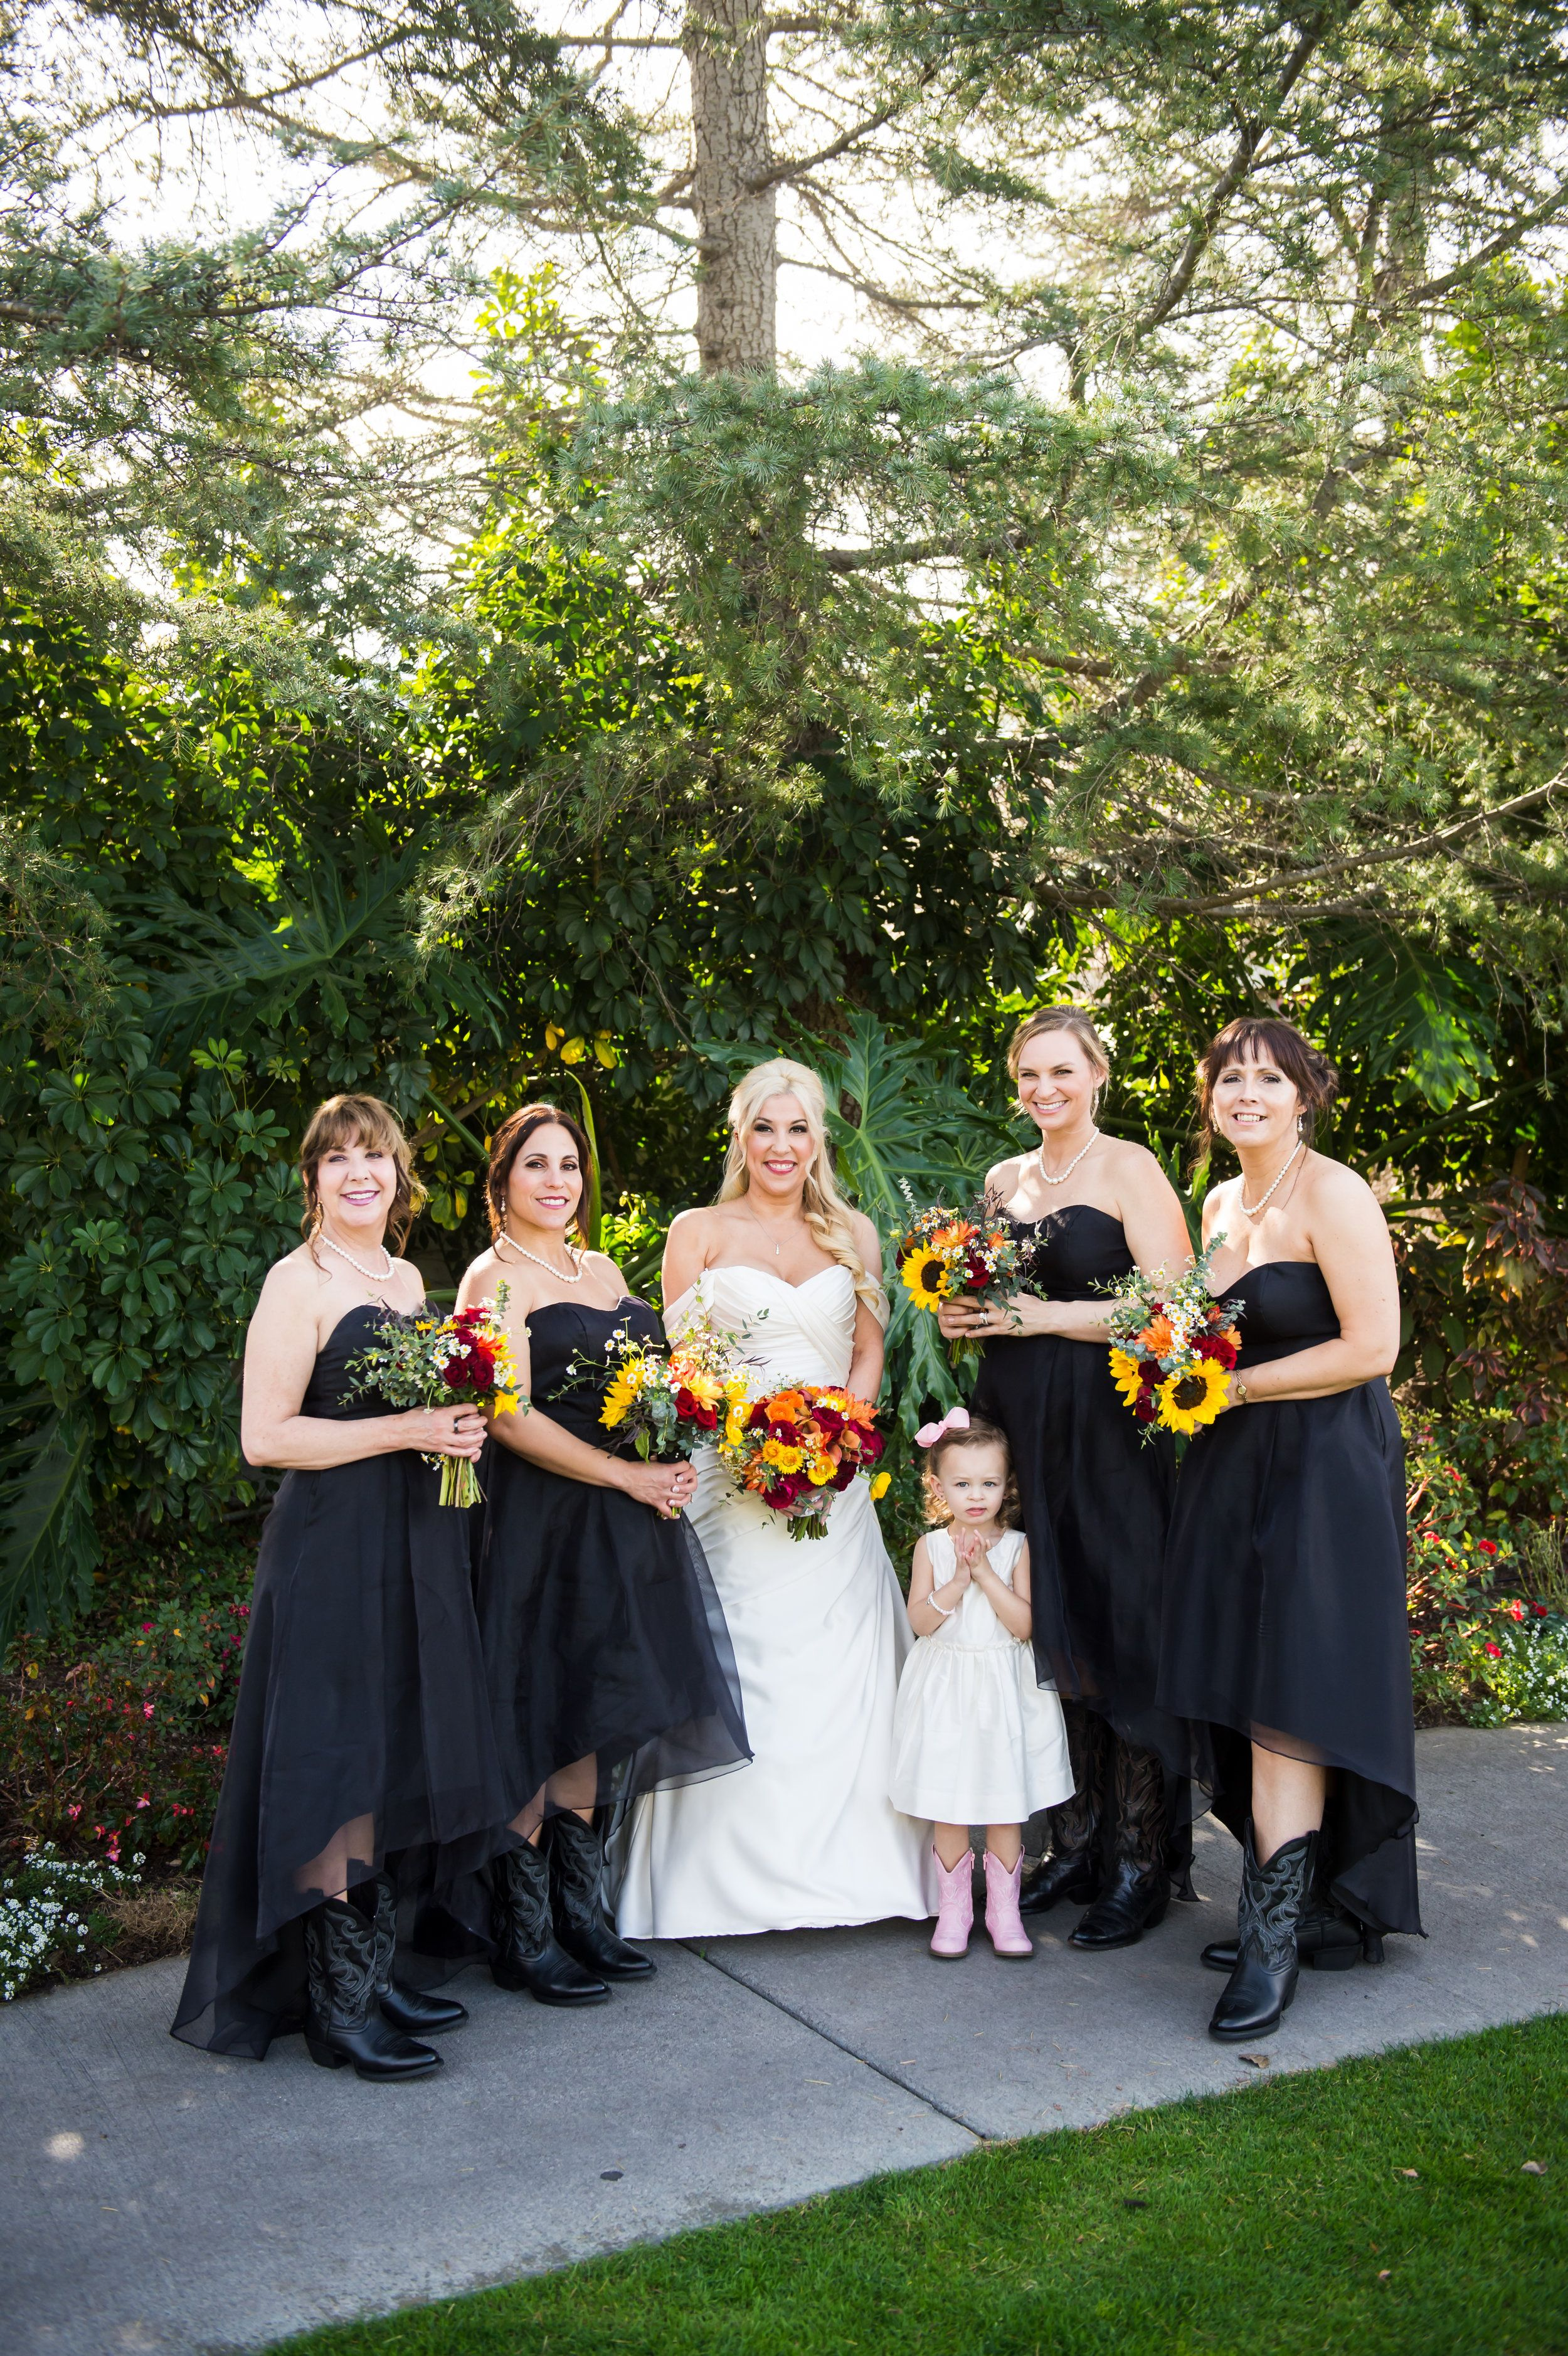 Strawberry Farms Golf Course Wedding Michelle Johnson Photography Golf Course Wedding Wedding Black Bridesmaid Dresses